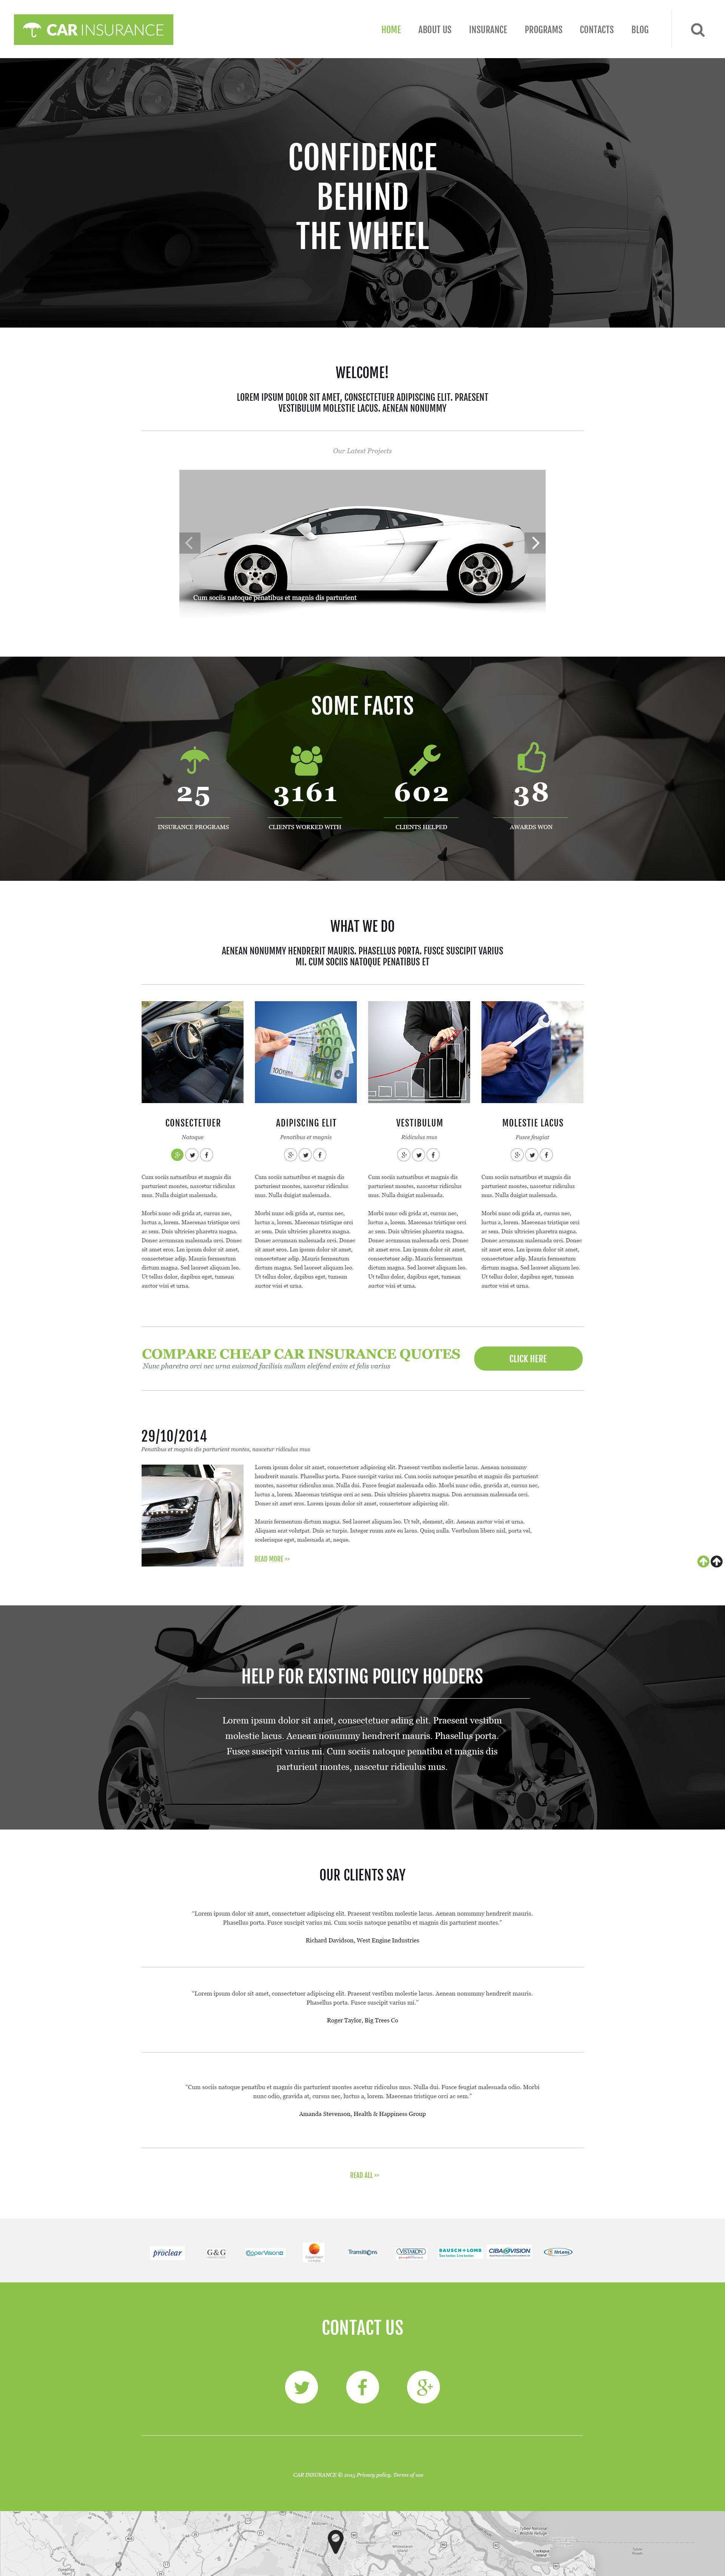 th me wordpress adaptatif 55029 pour soci t s d 39 assurance automobile. Black Bedroom Furniture Sets. Home Design Ideas